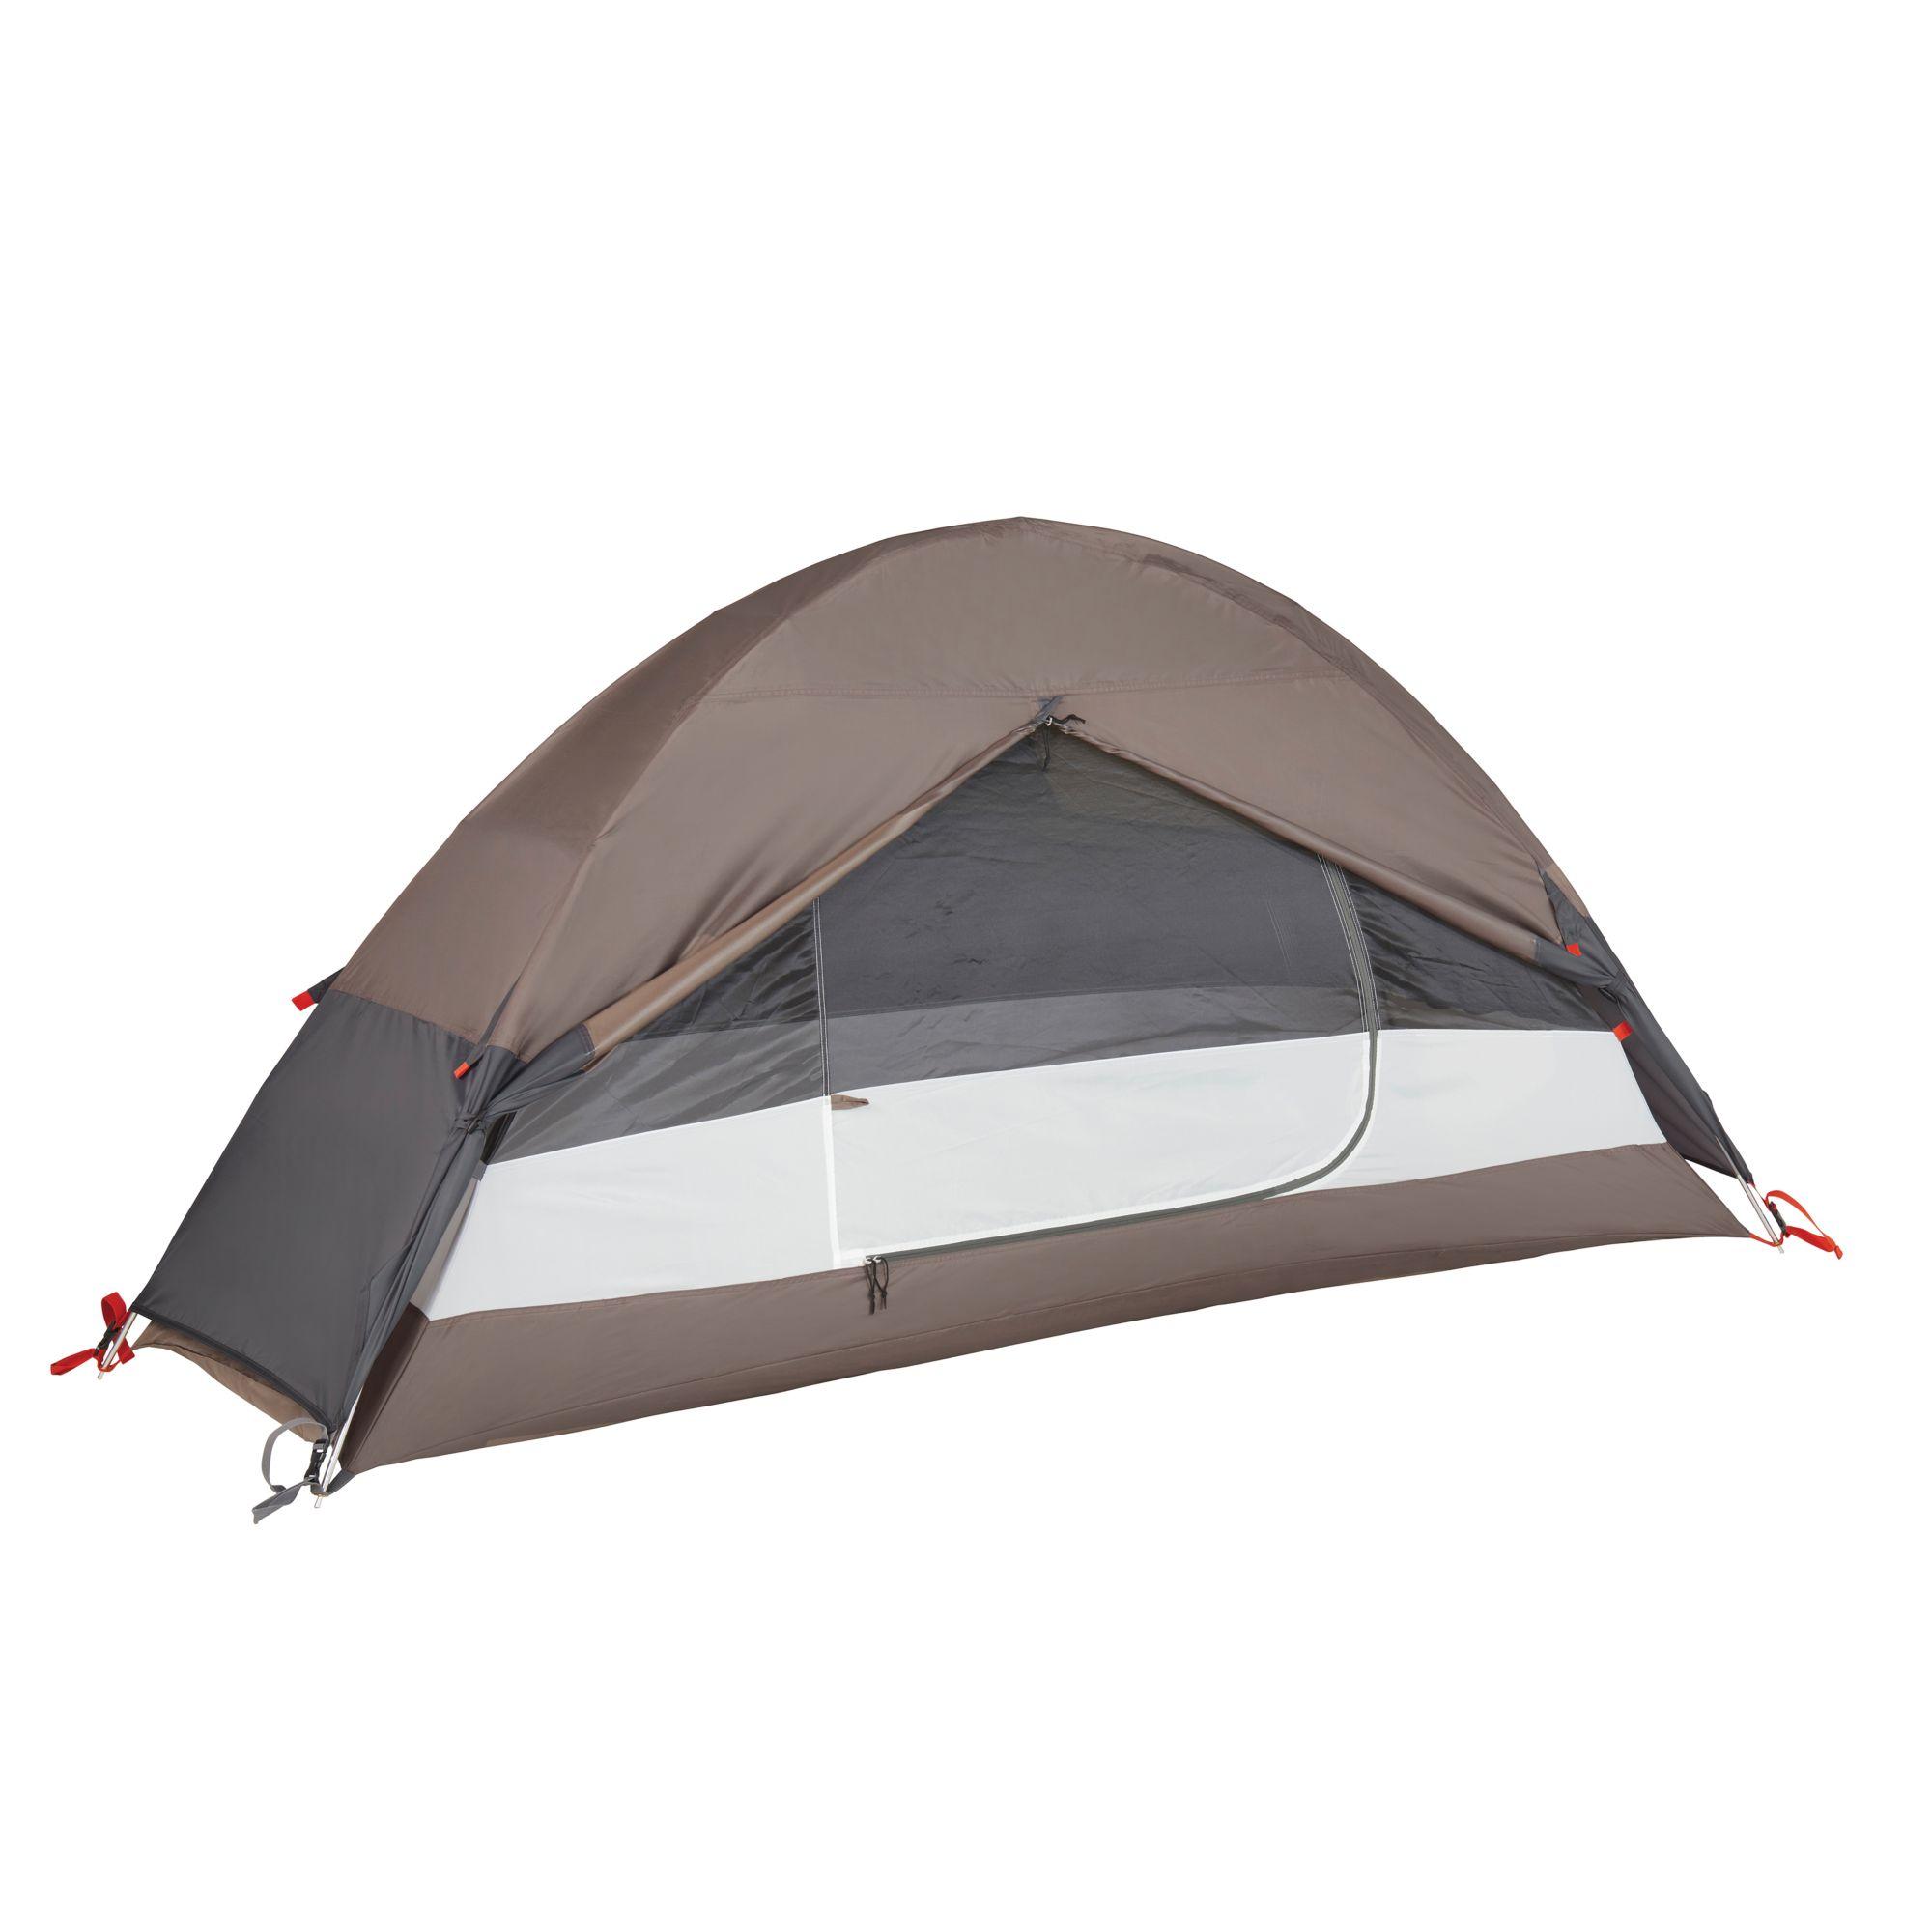 sc 1 st  DICKu0027S Sporting Goods & Kelty Circuit 1 Person Tent | DICKu0027S Sporting Goods